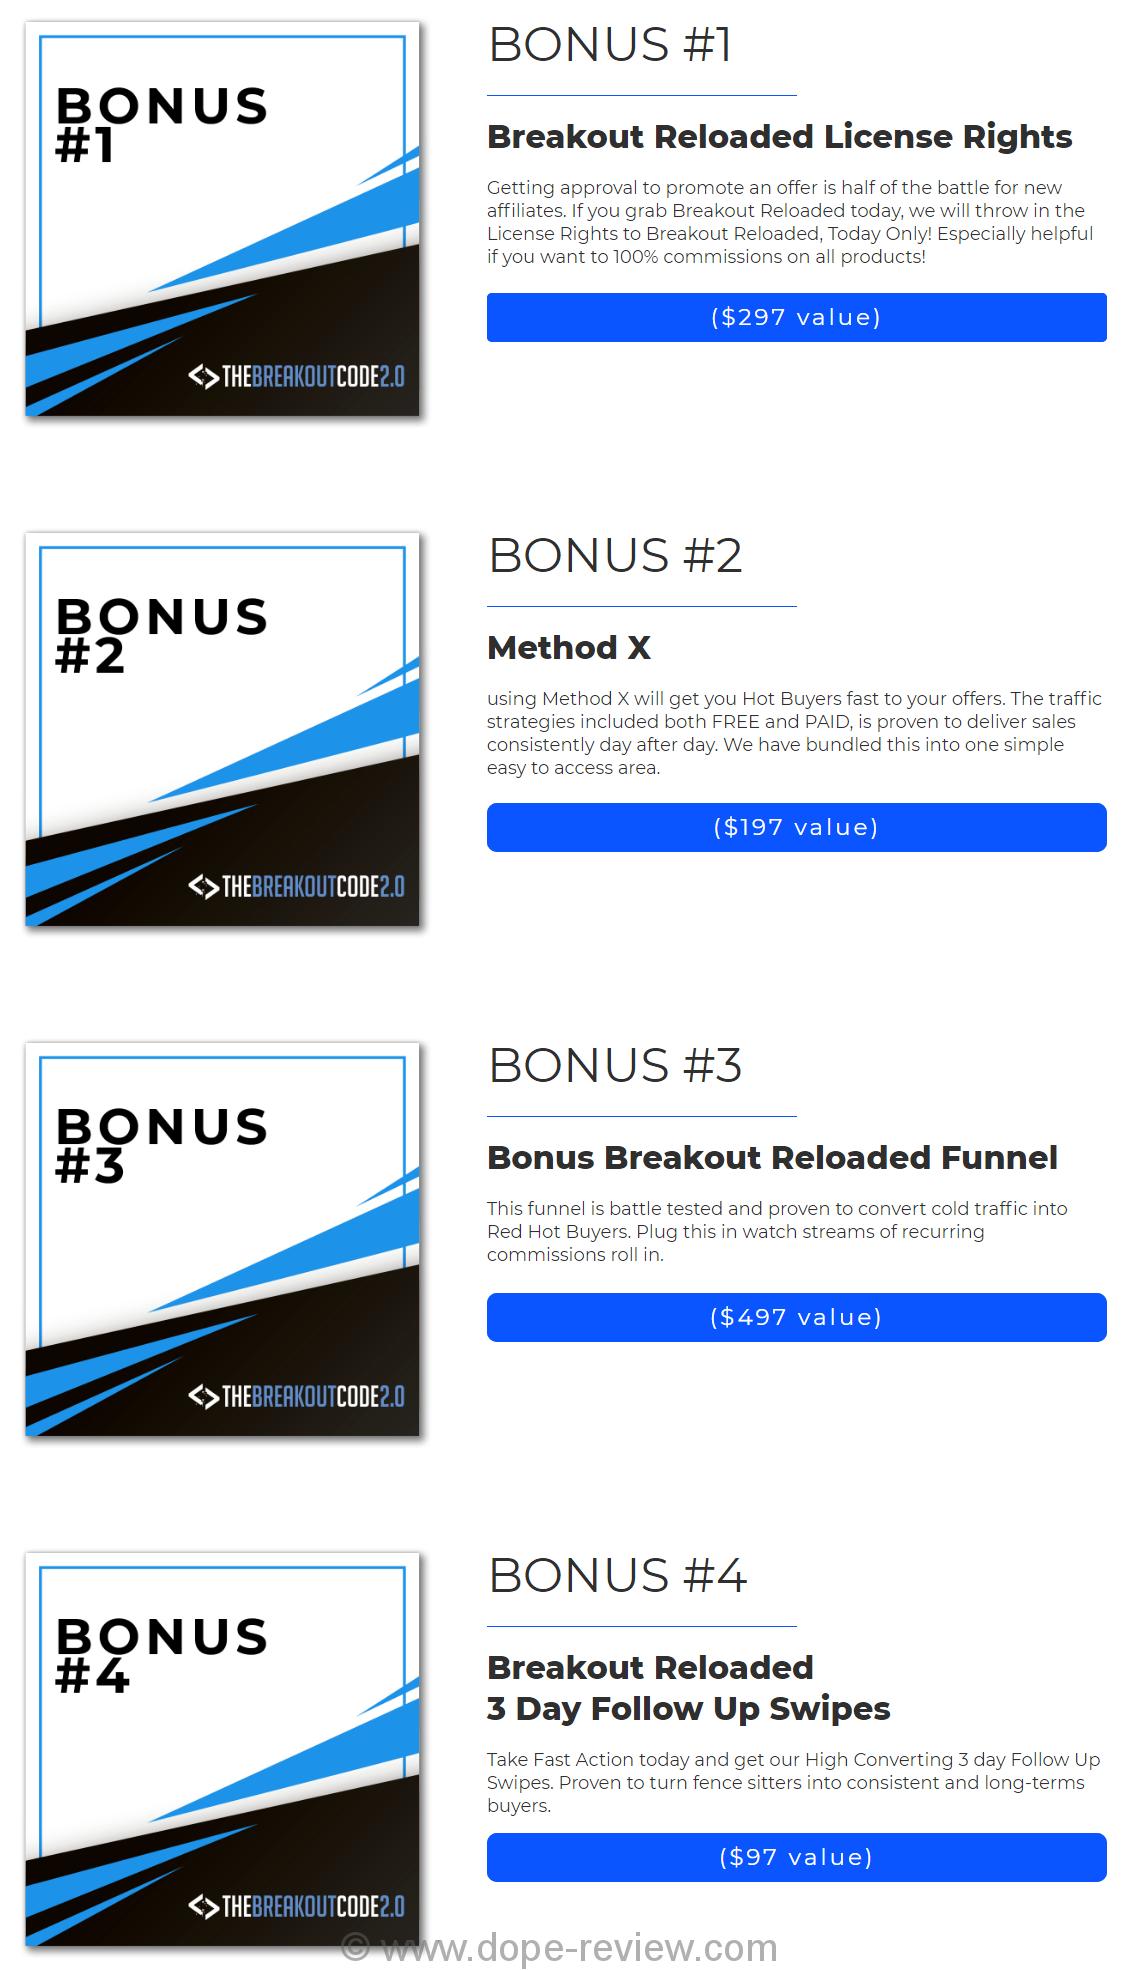 Breakout Reloaded Bonus